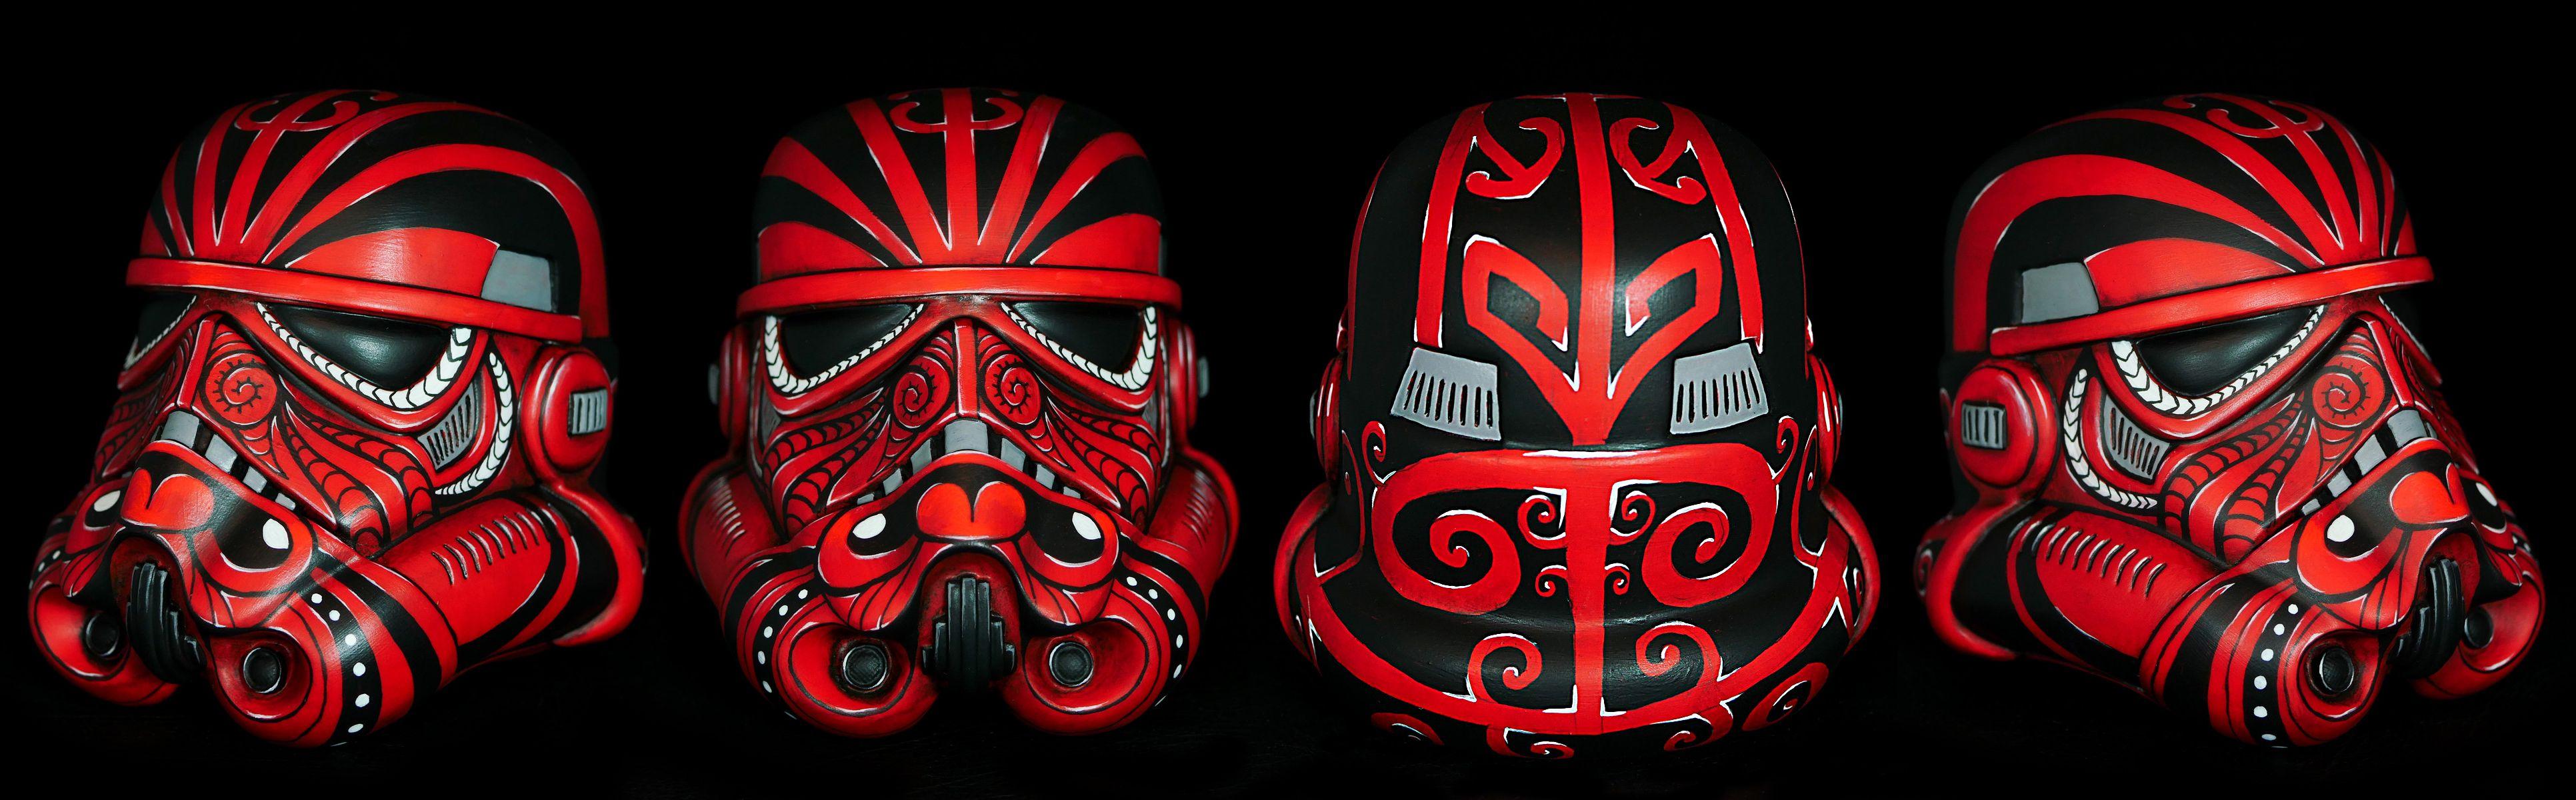 Mokotrooper custom vinyl stormtrooper helmet - Star Wars Maori New Zealand & Mokotrooper custom vinyl stormtrooper helmet - Star Wars Maori New ...